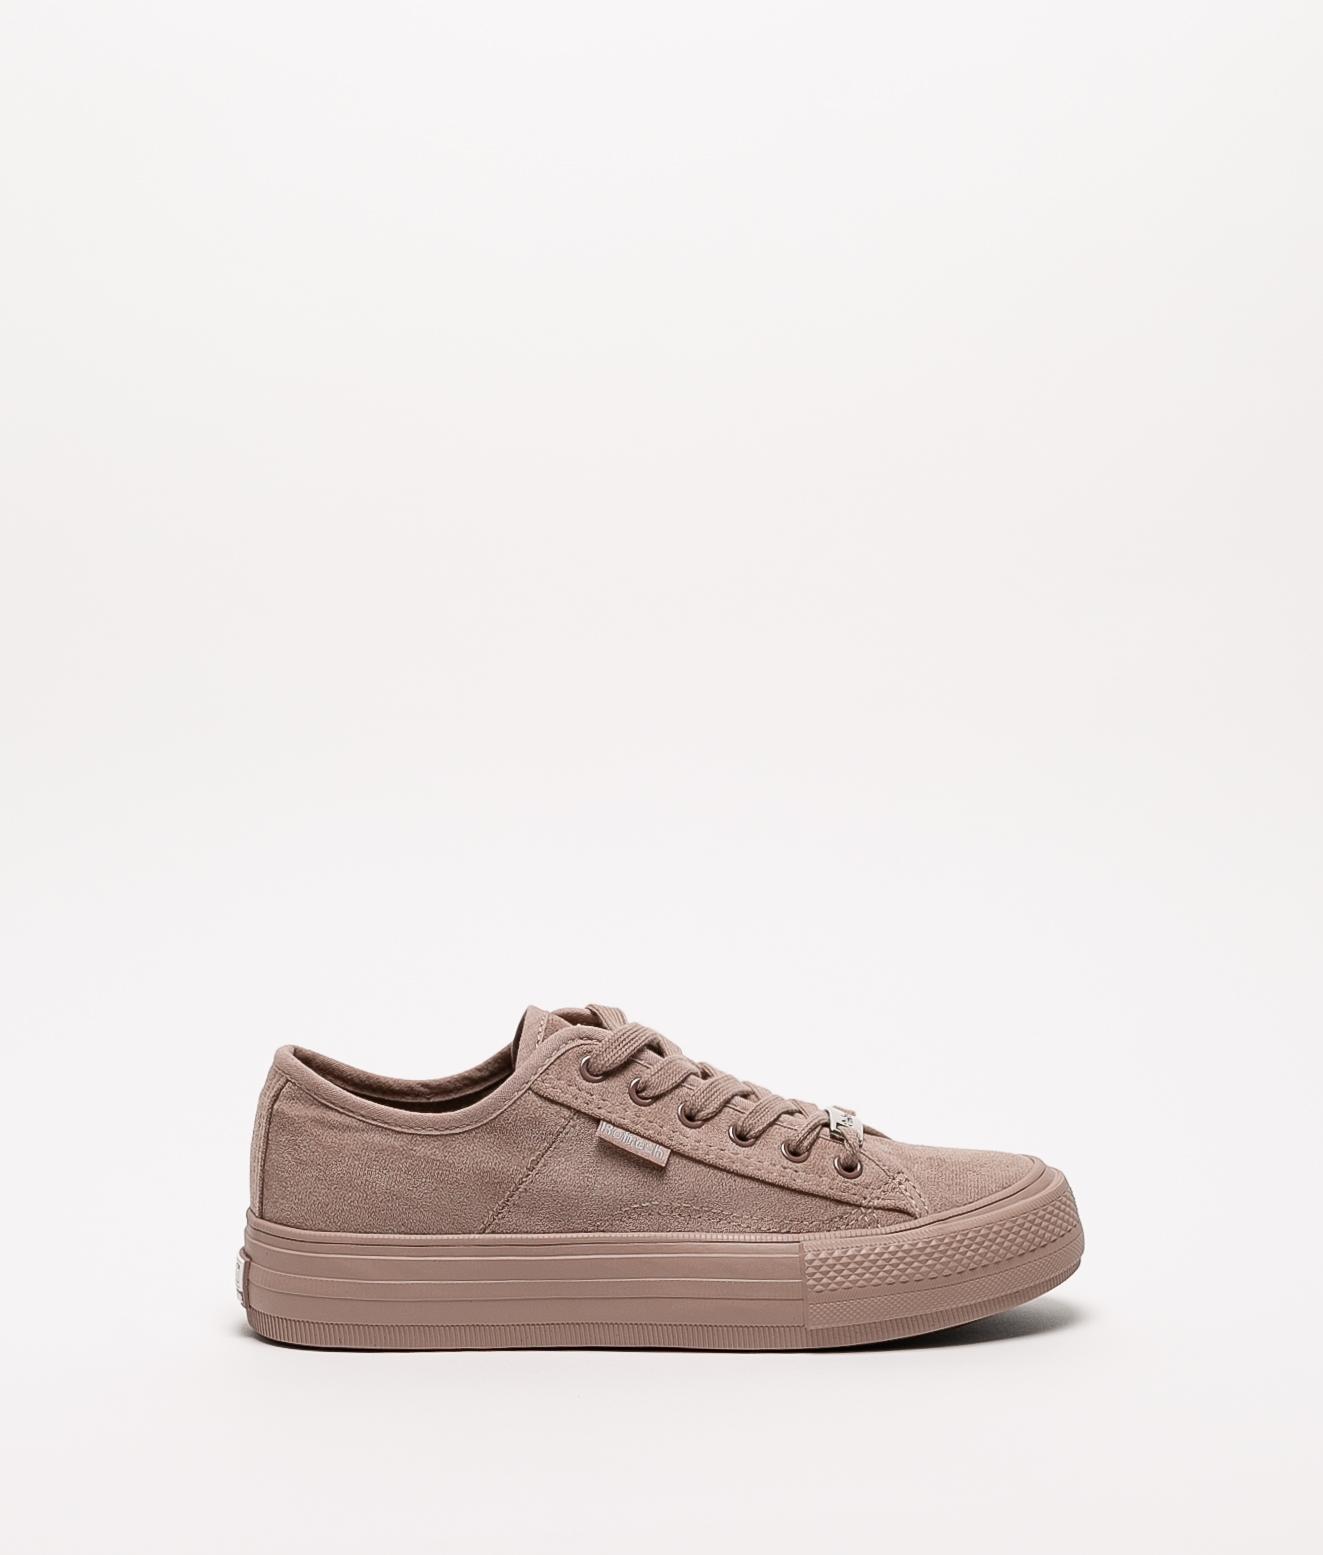 Sneakers Tule Refresh - Taupe